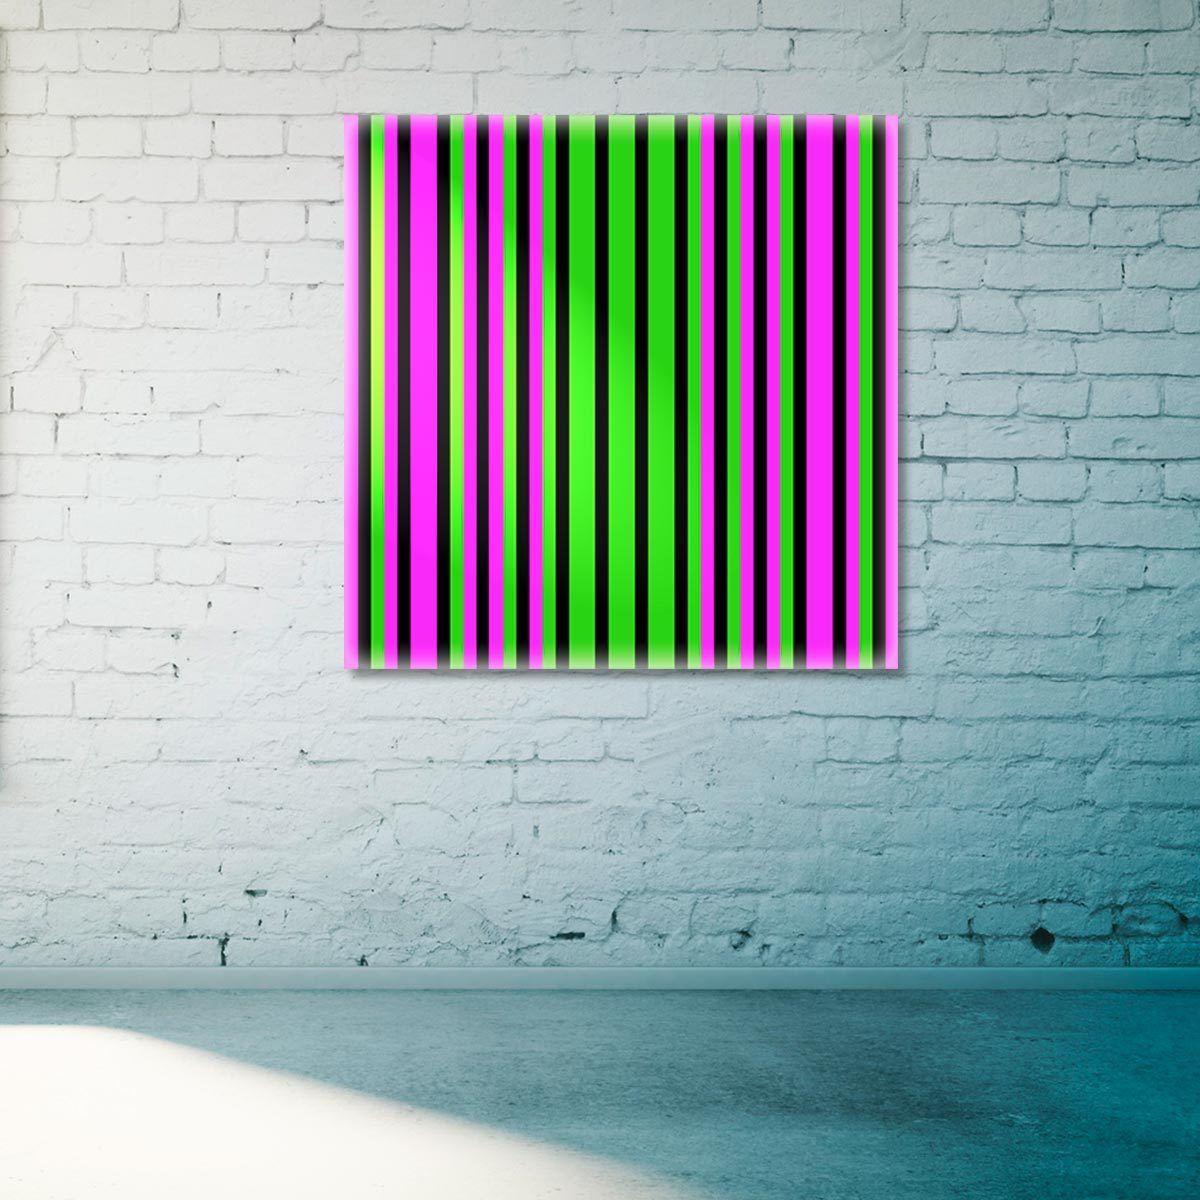 Artwork Bilder Bestellen Fotoabzuge Wandbilder